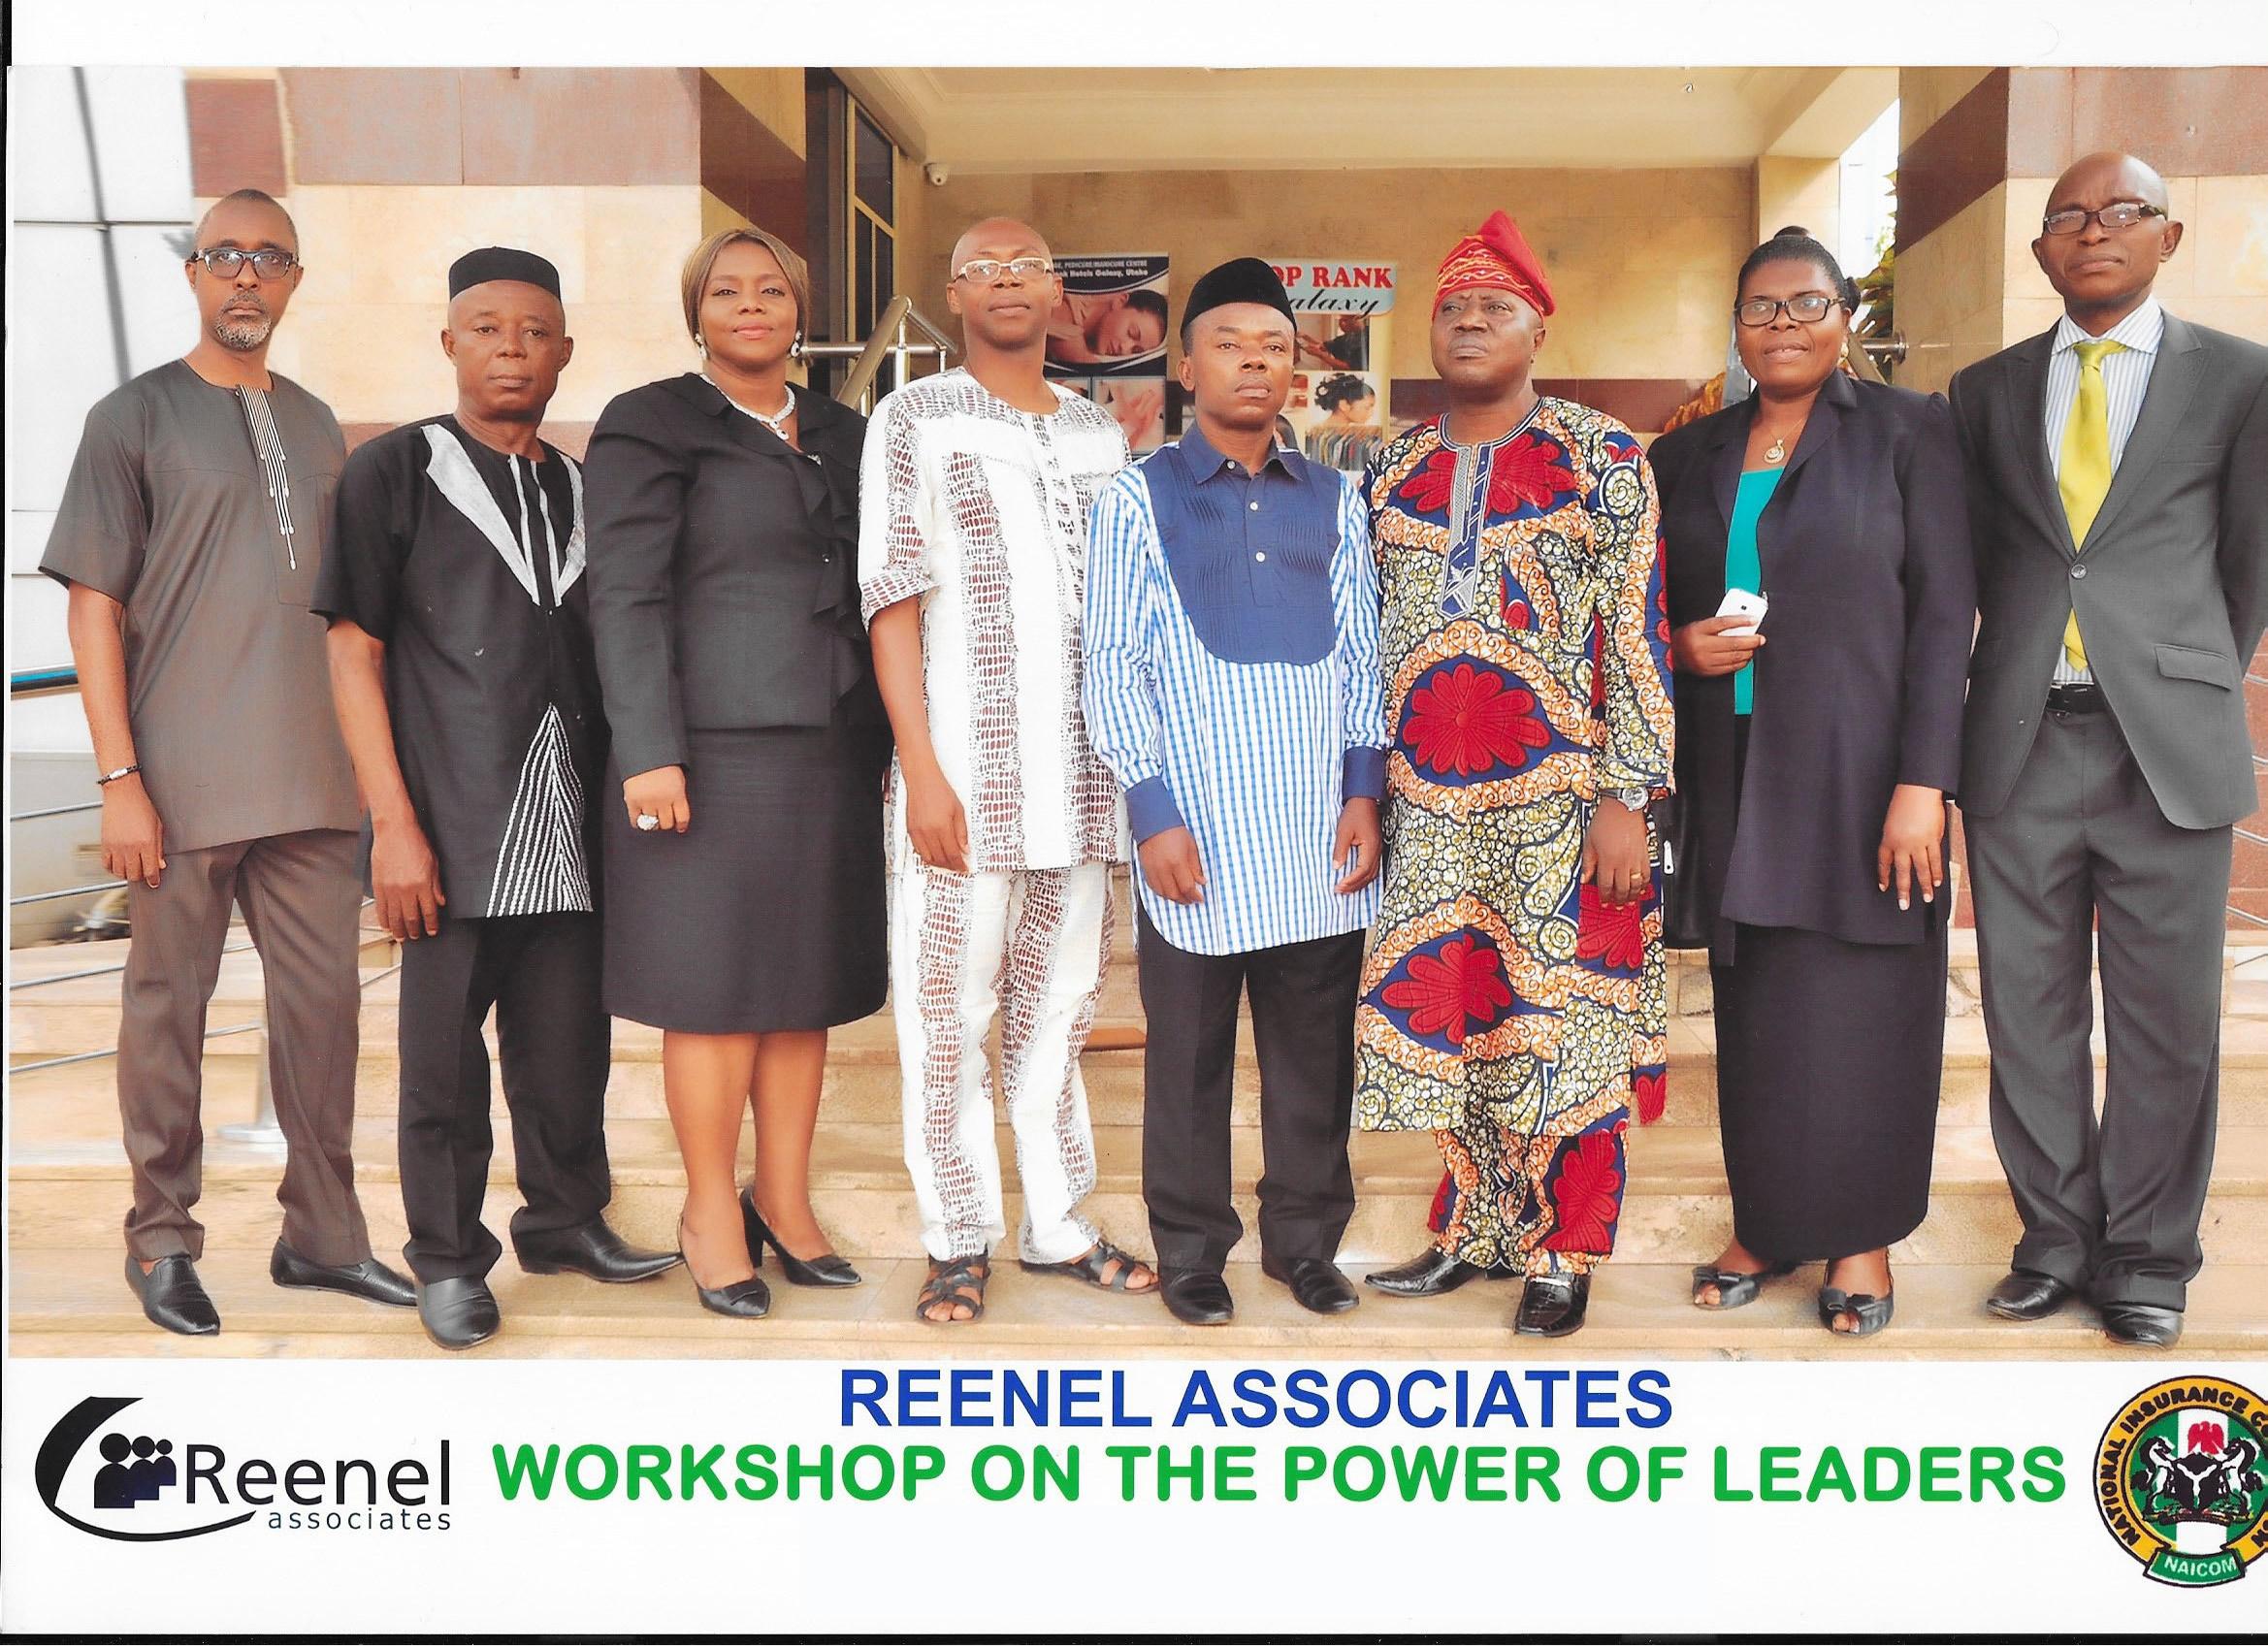 Reenel Associates